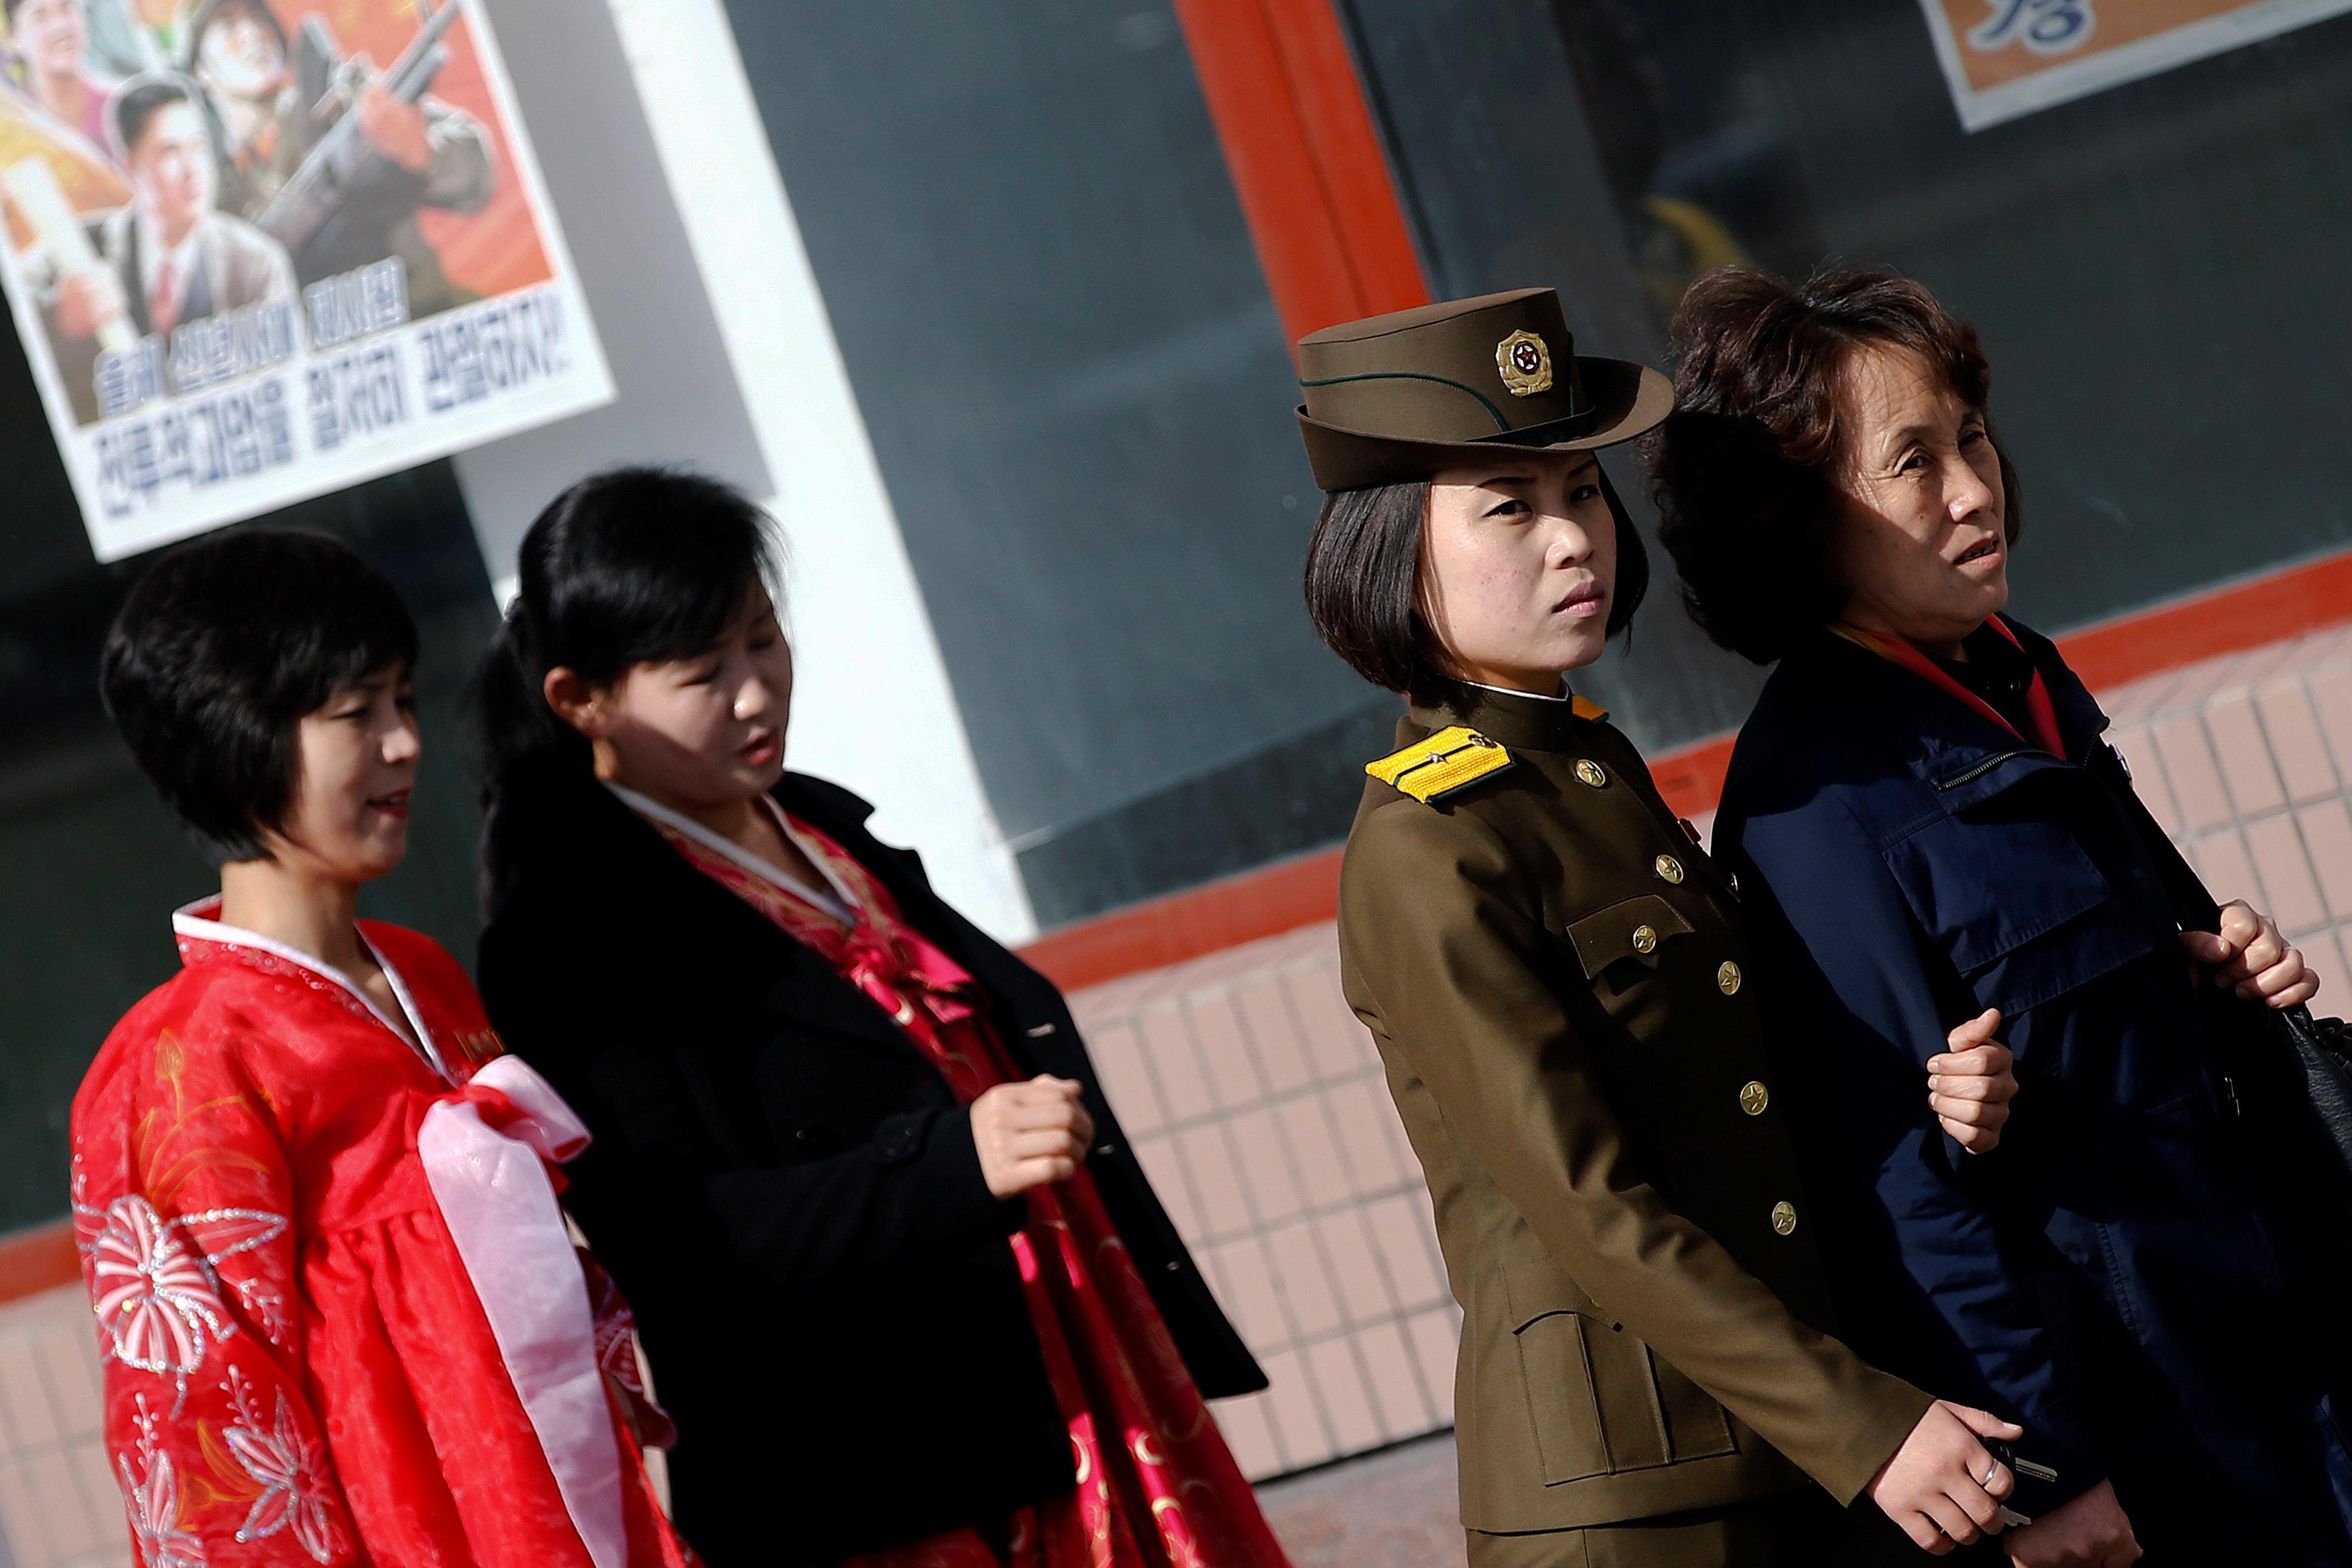 People commute in central Pyongyang, North Korea April 12, 2017. (REUTERS/Damir Sagolj)